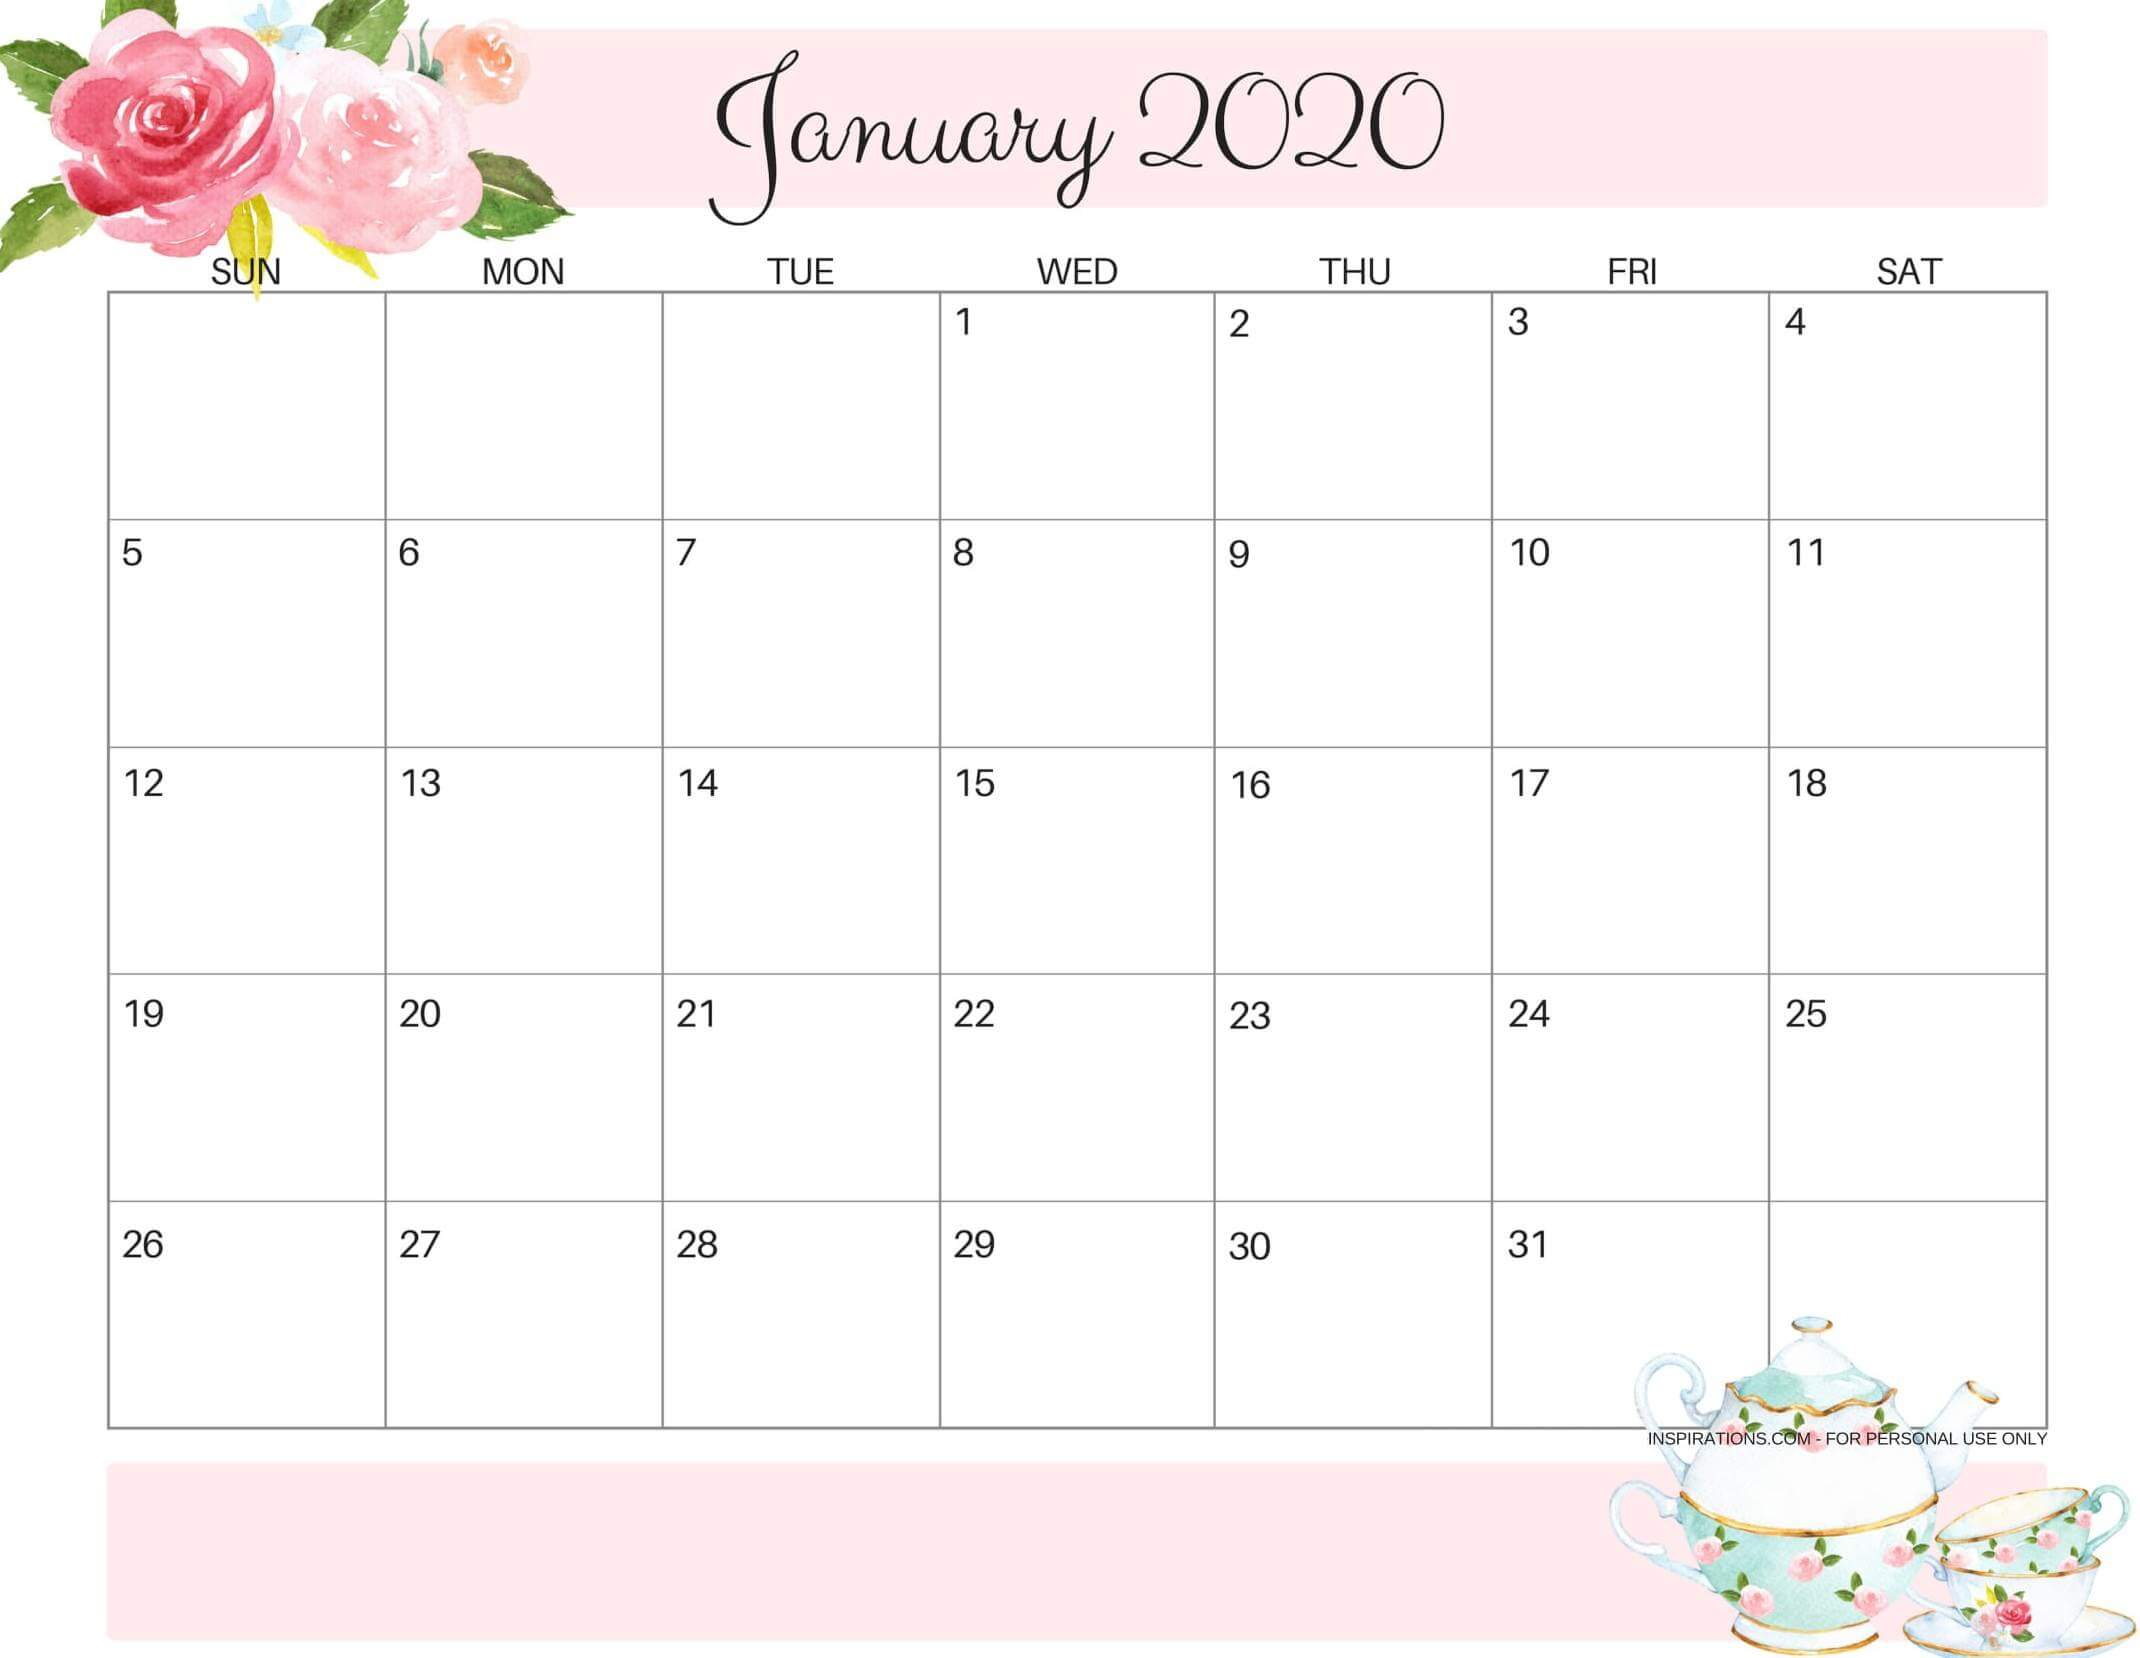 Pick 2020 Calligraphy Calender Printable | Calendar ...